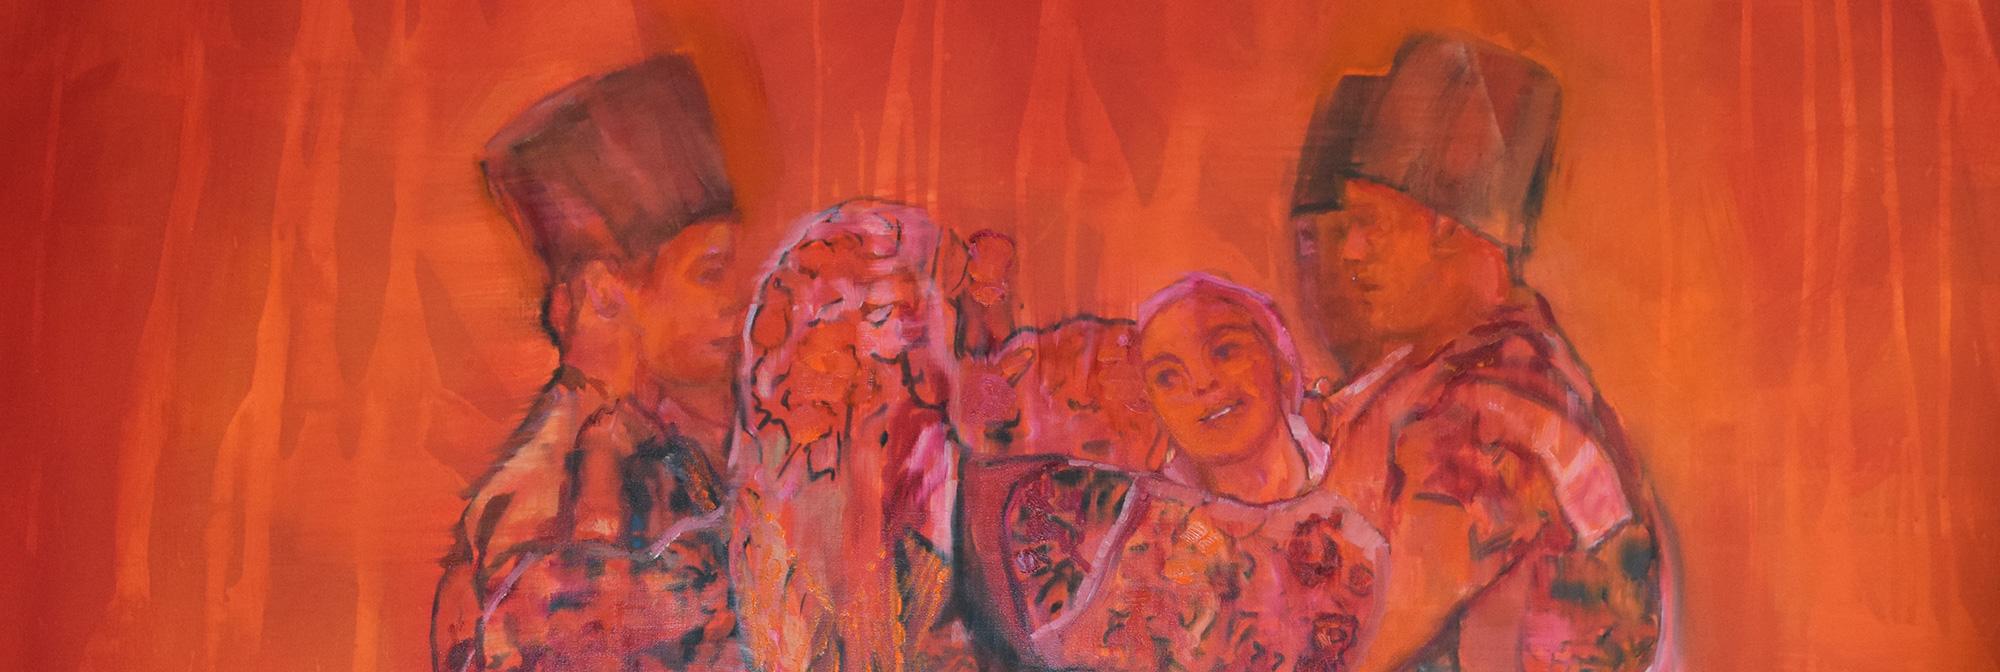 Orange canvas painting of 6 people doing romanian folk dancing